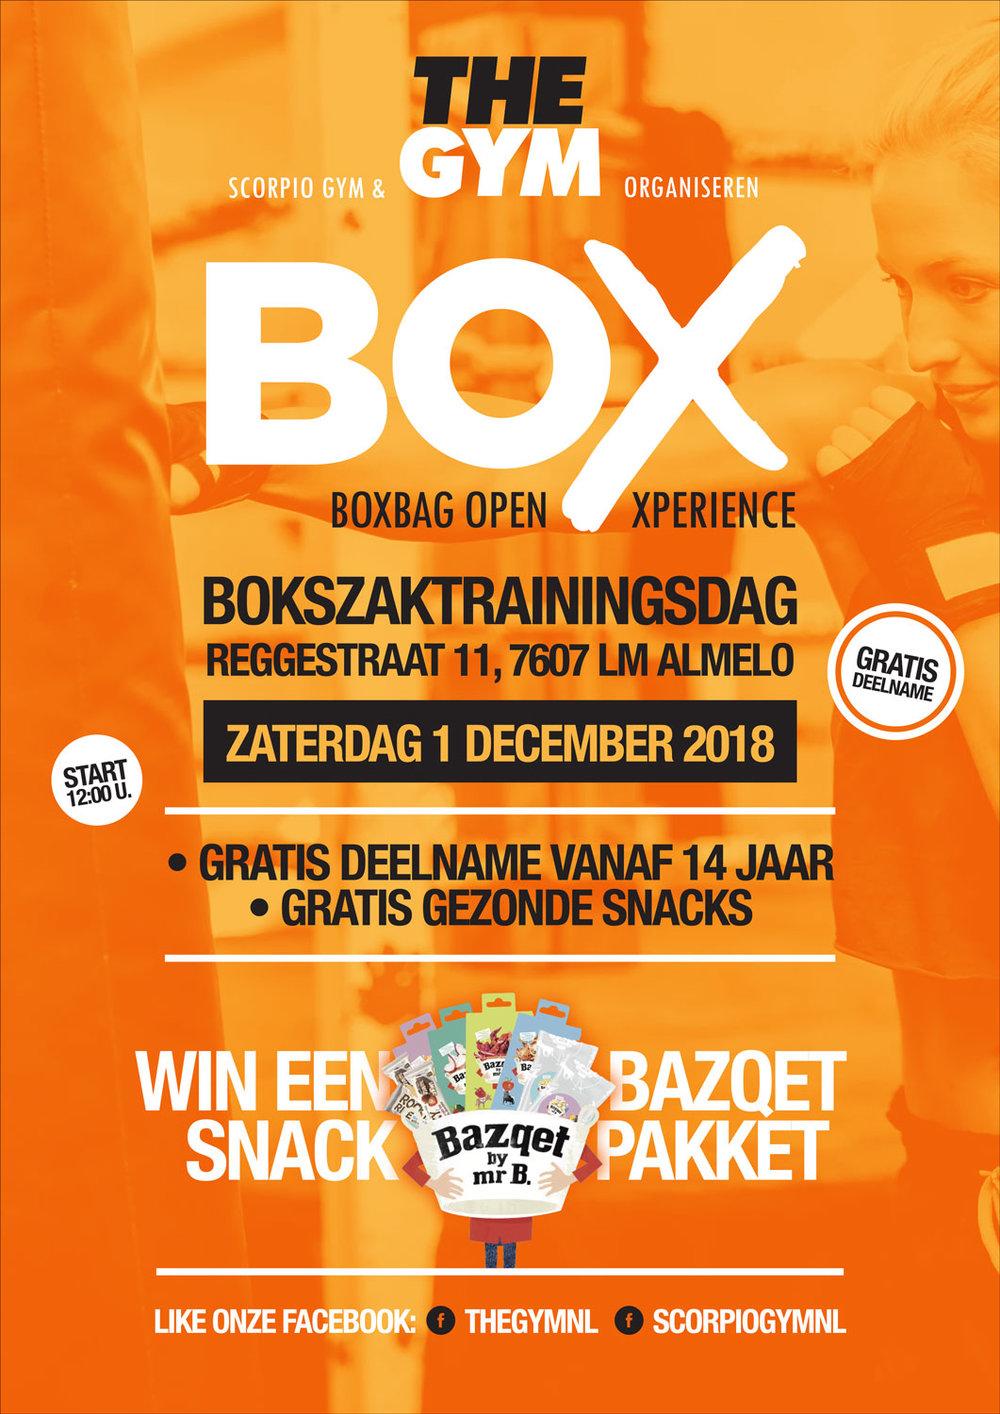 Boxbag-Open-Xperience[13198].jpg